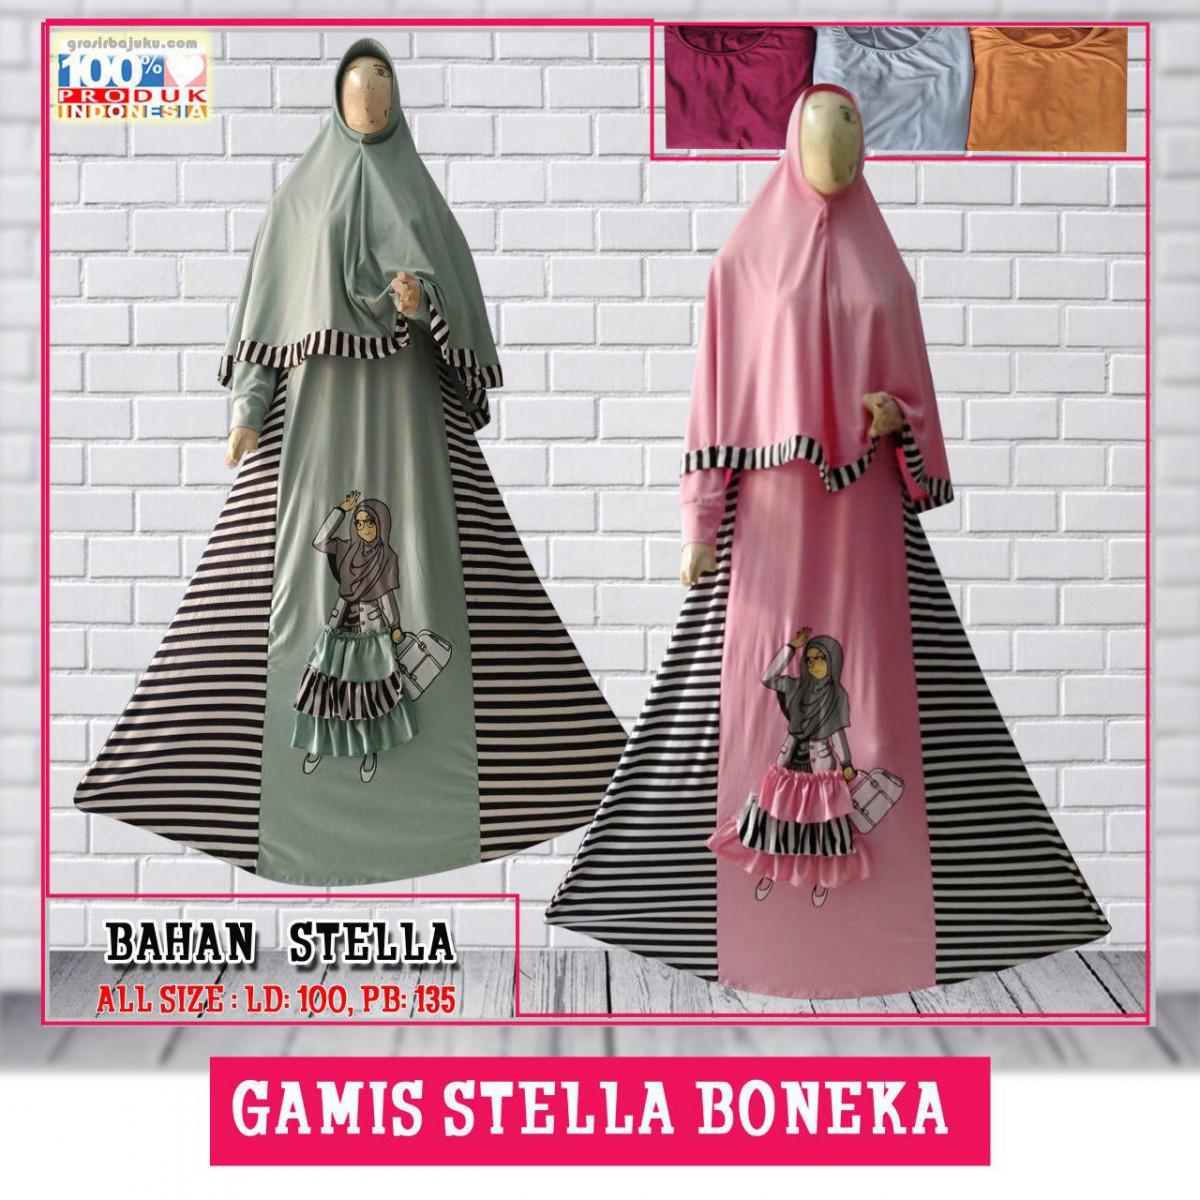 Gamis Stella Boneka